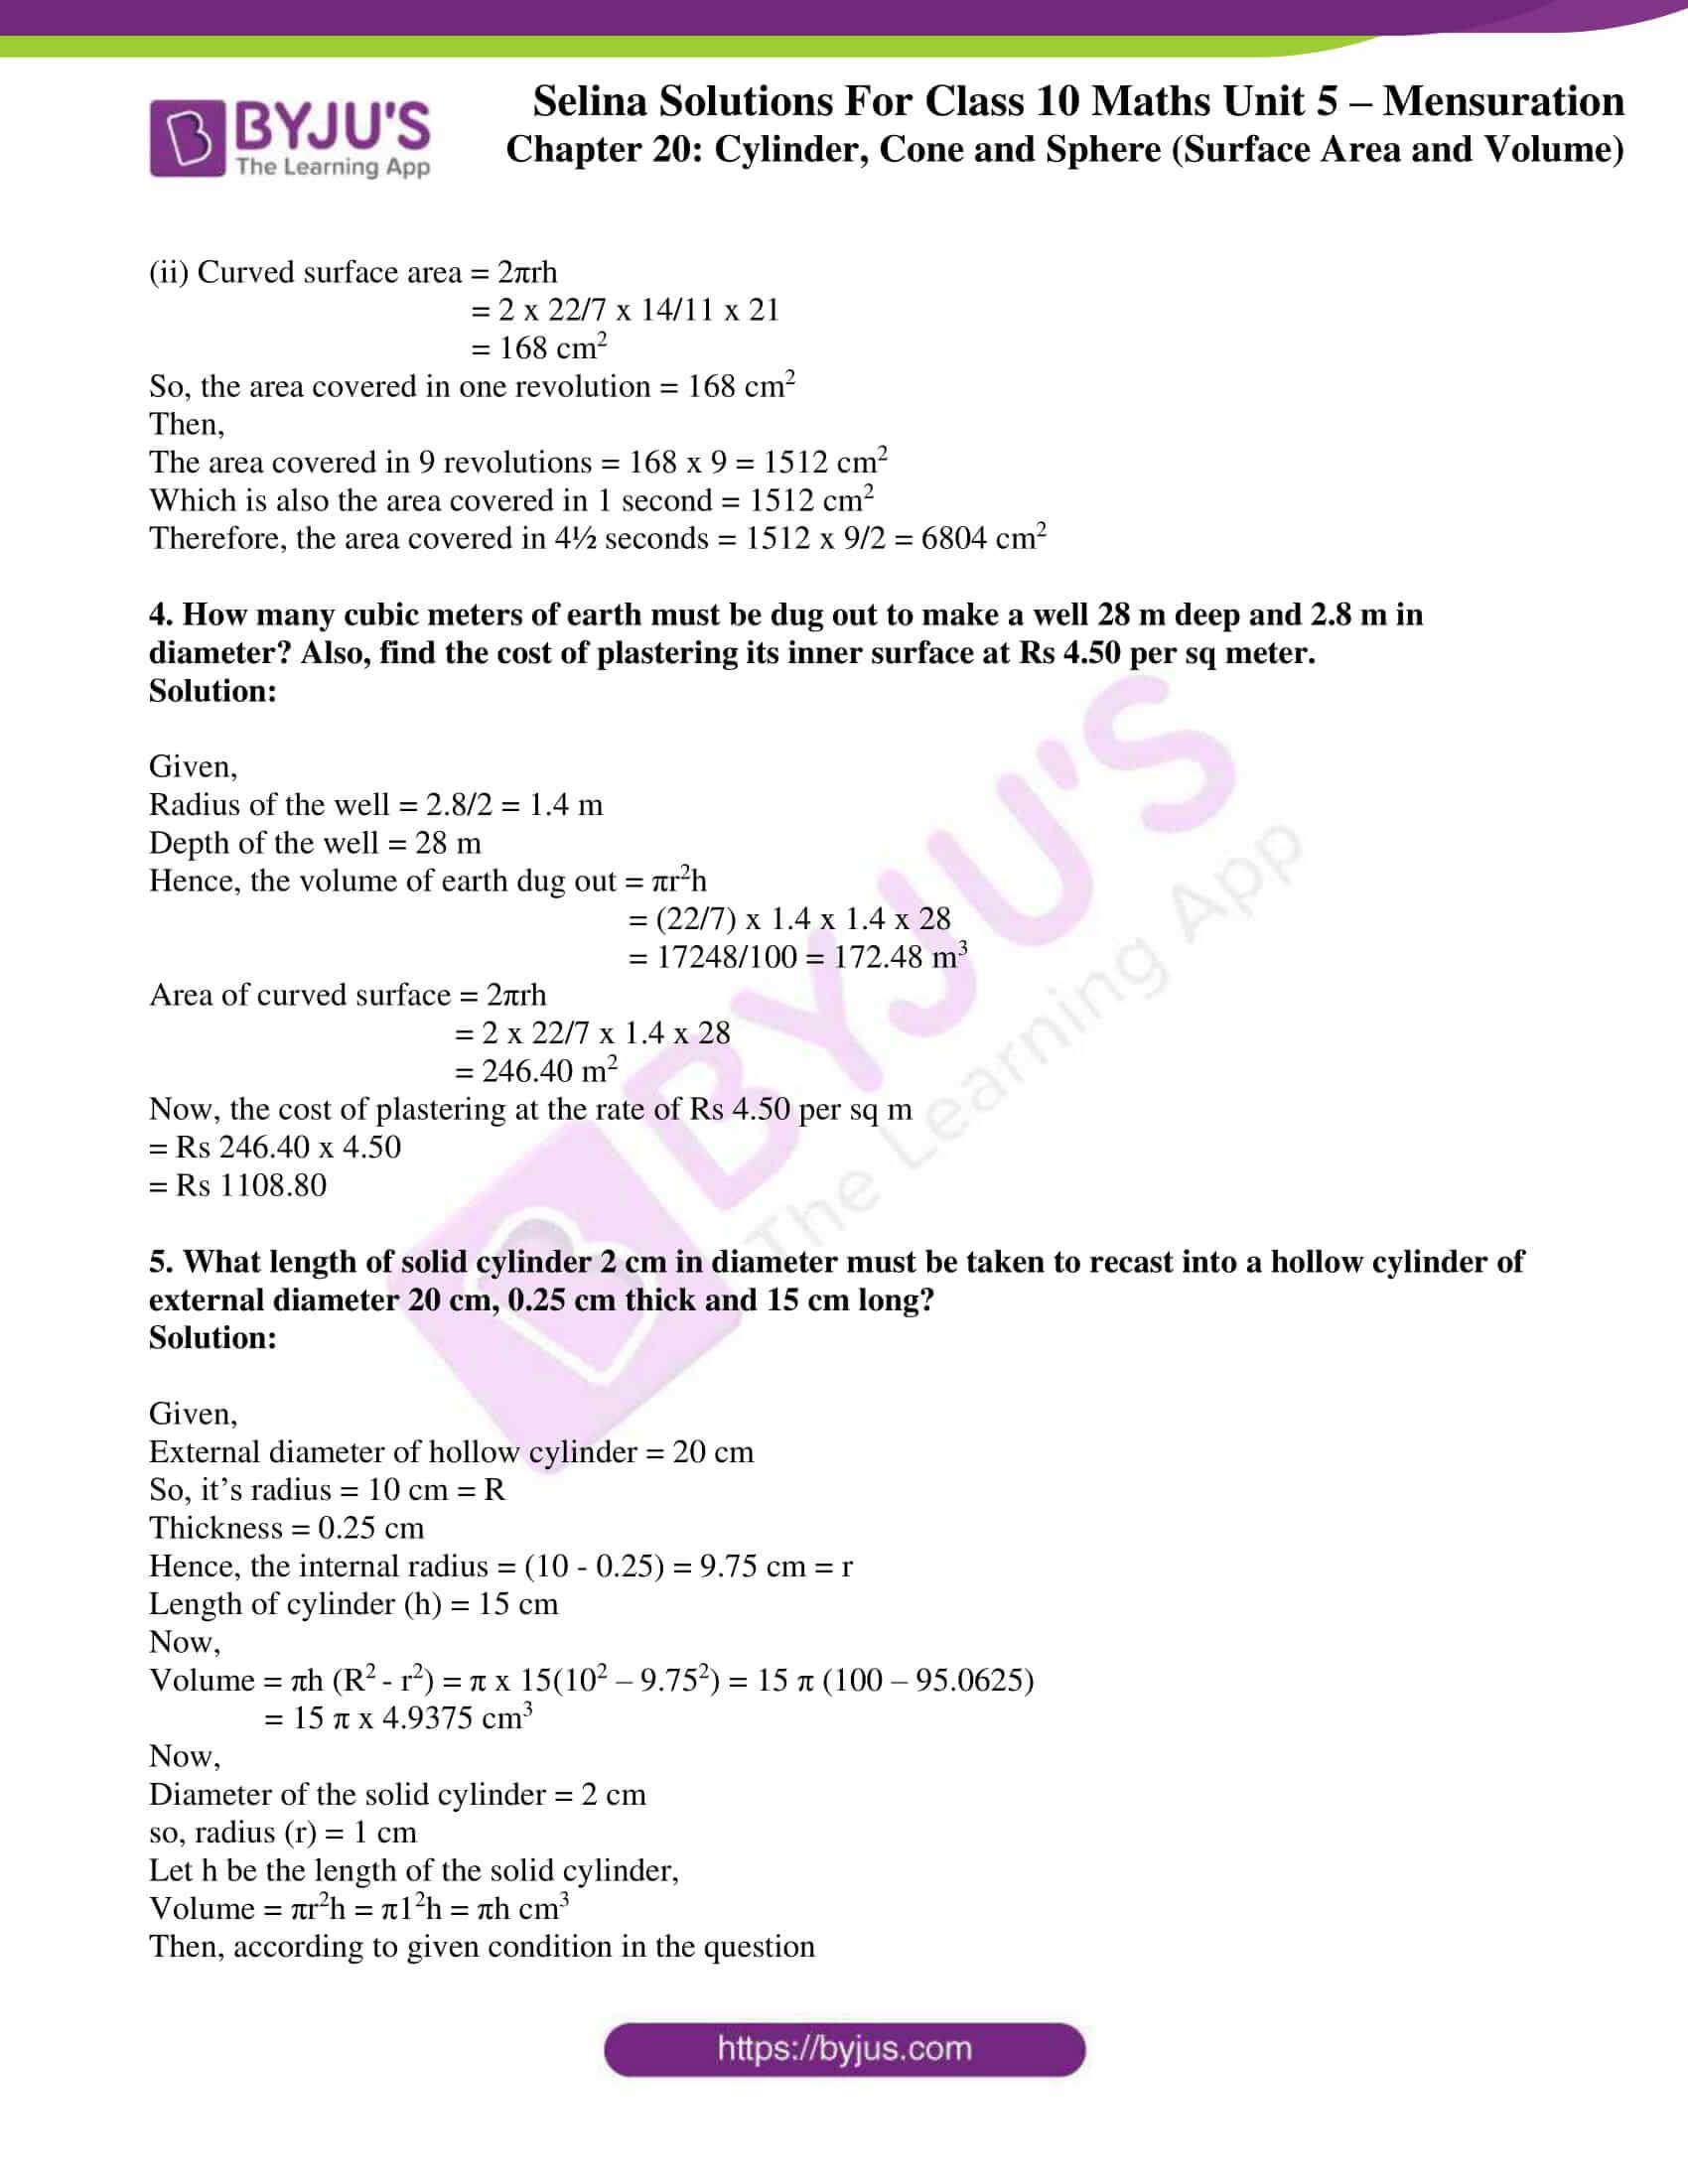 selina-sol-maths-class-10-ch-20-ex-a-2